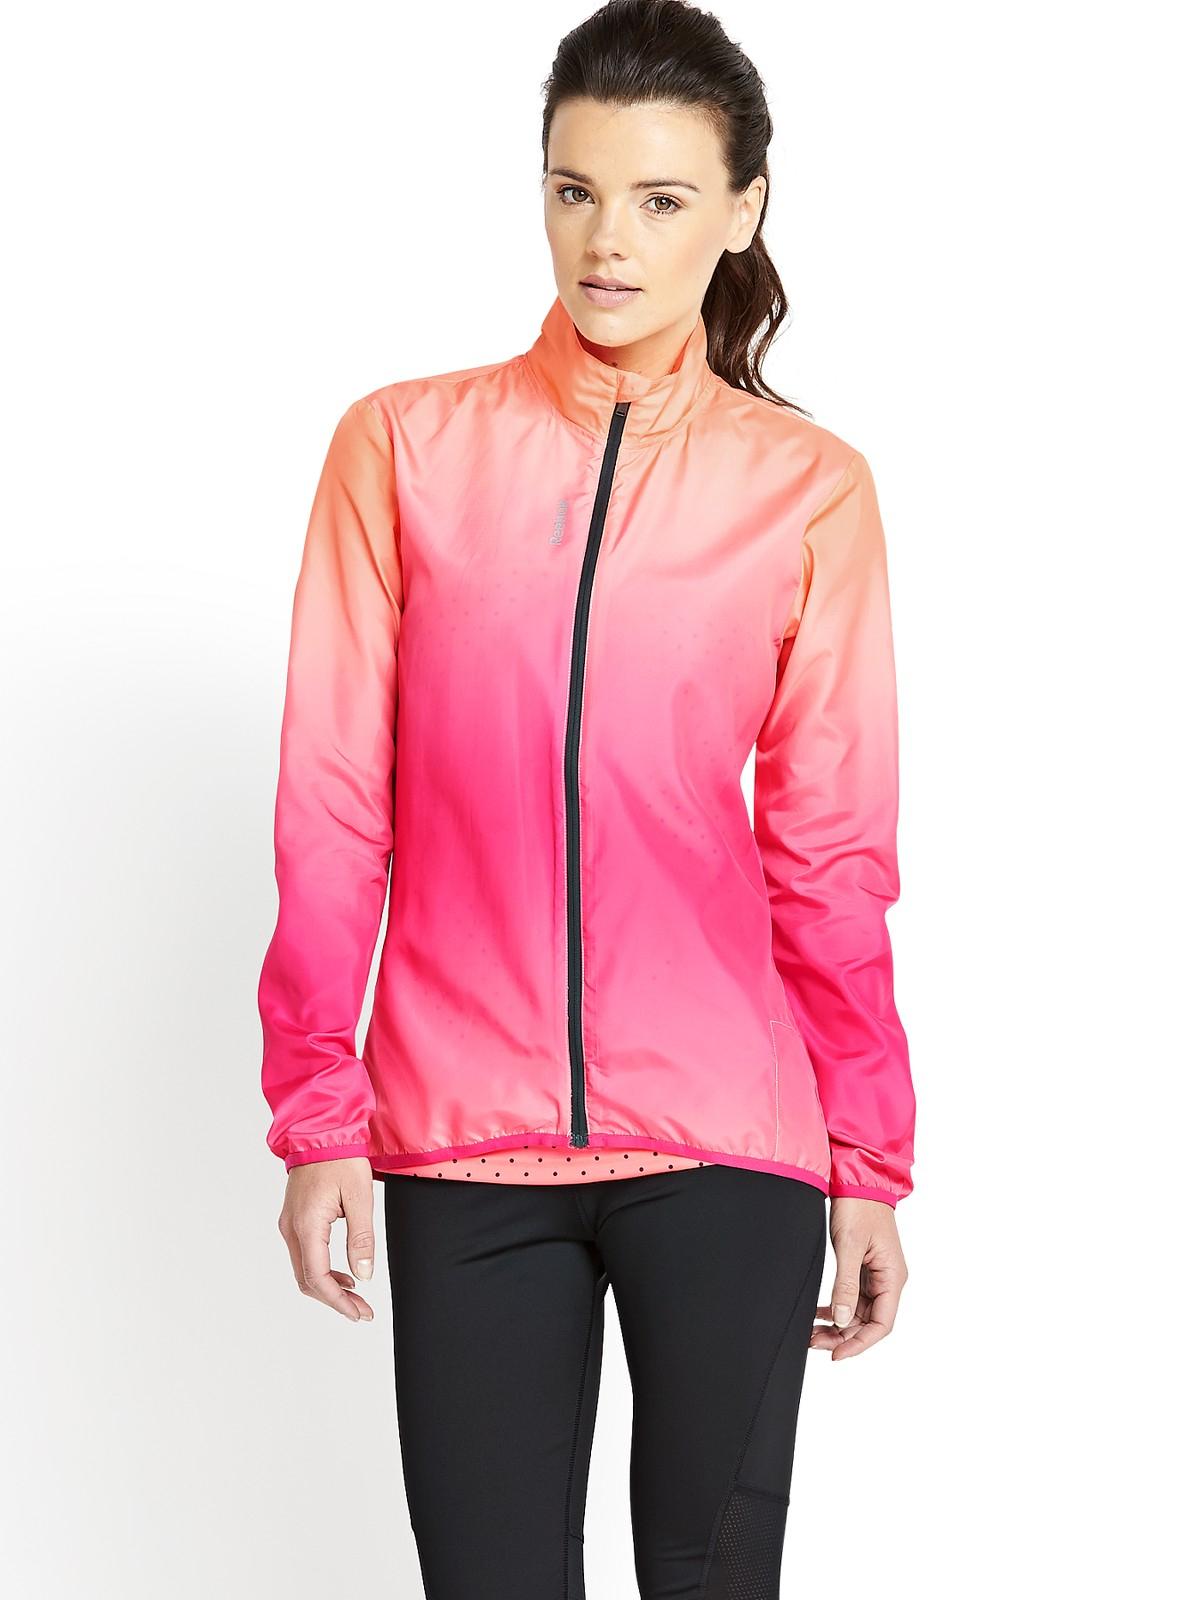 Reebok Running Jacket In Pink Multi  Lyst-5001